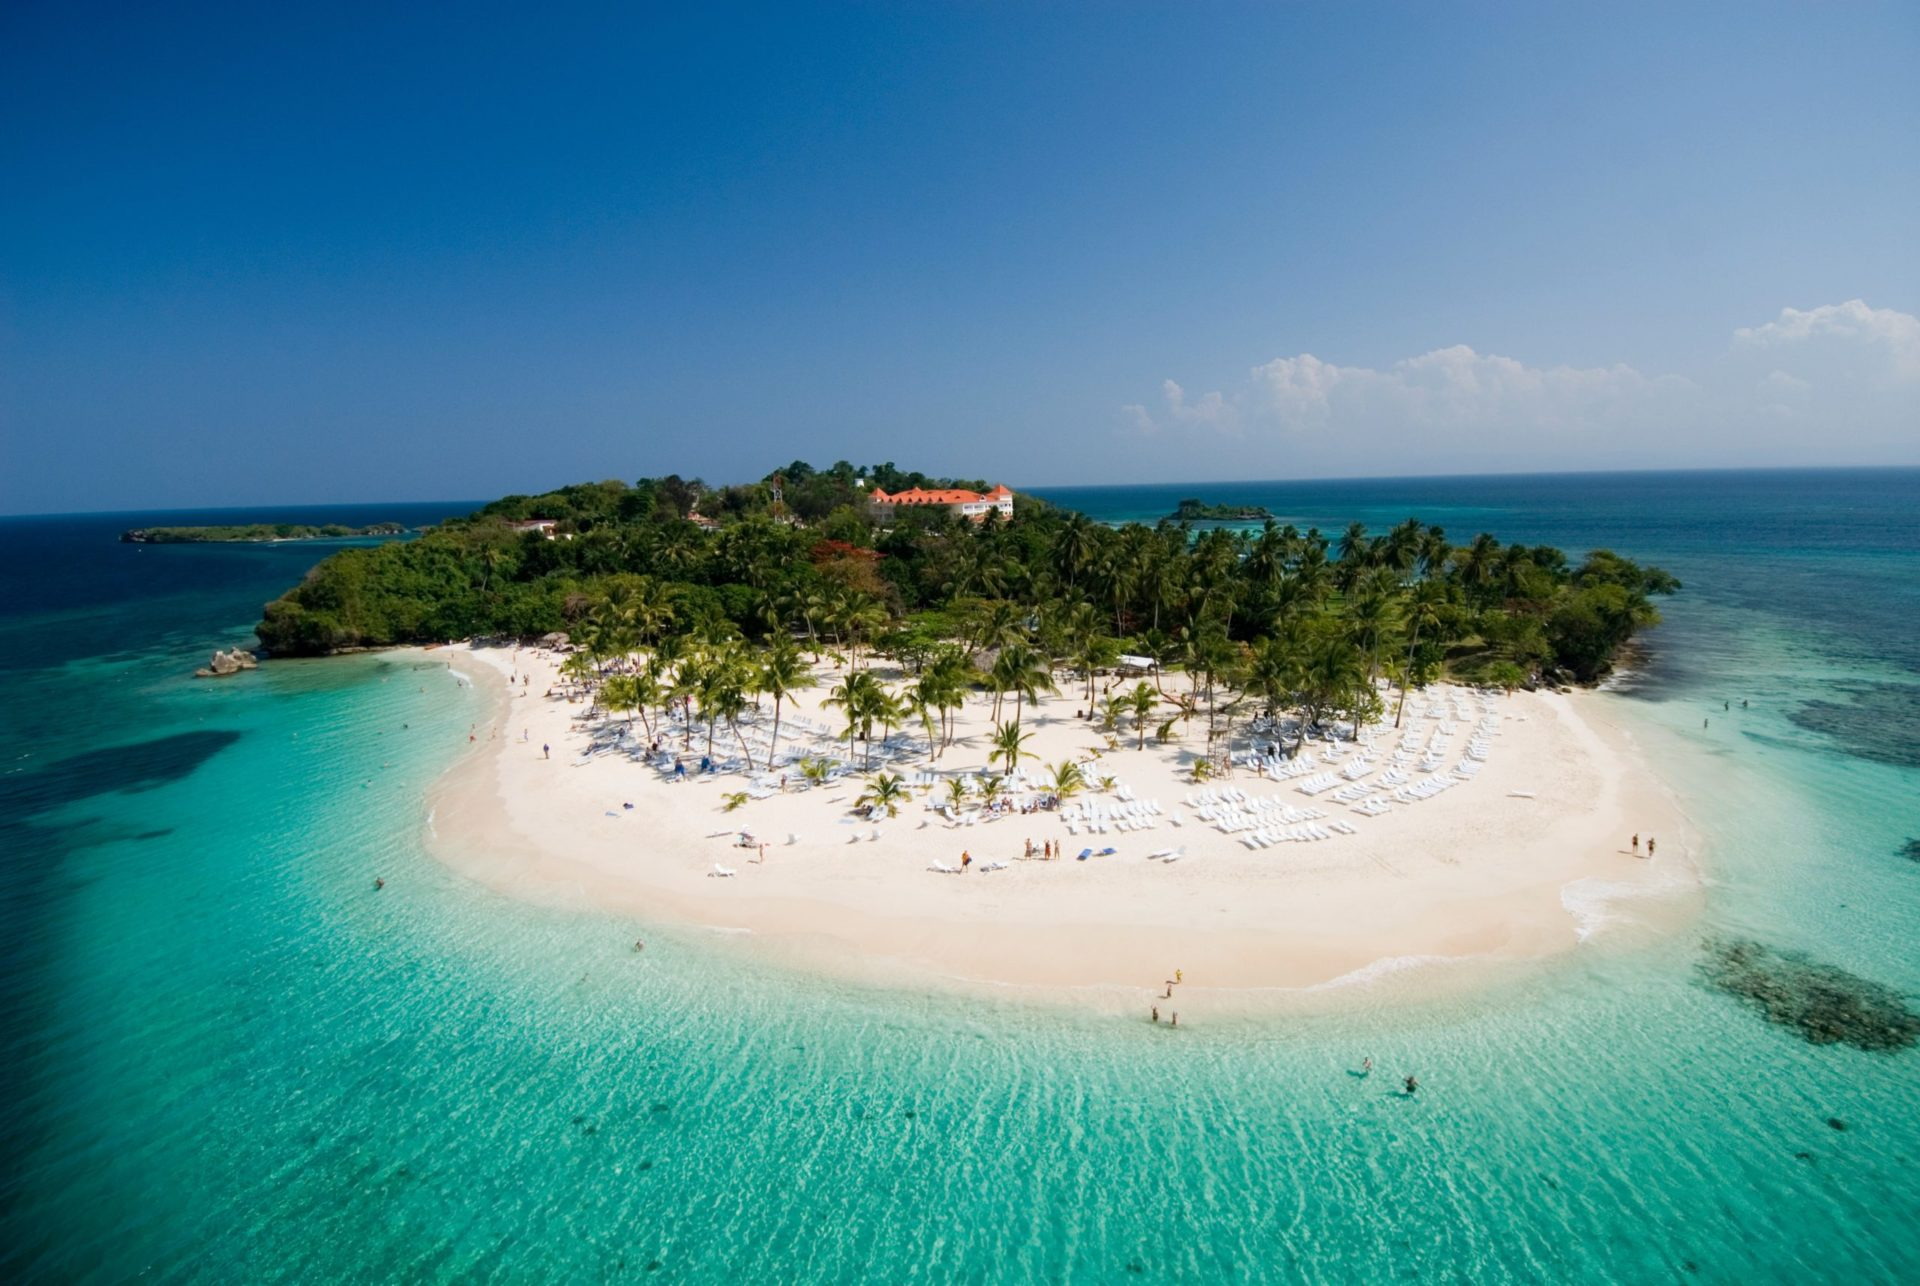 Wassertemperatur Dominikanische Republik